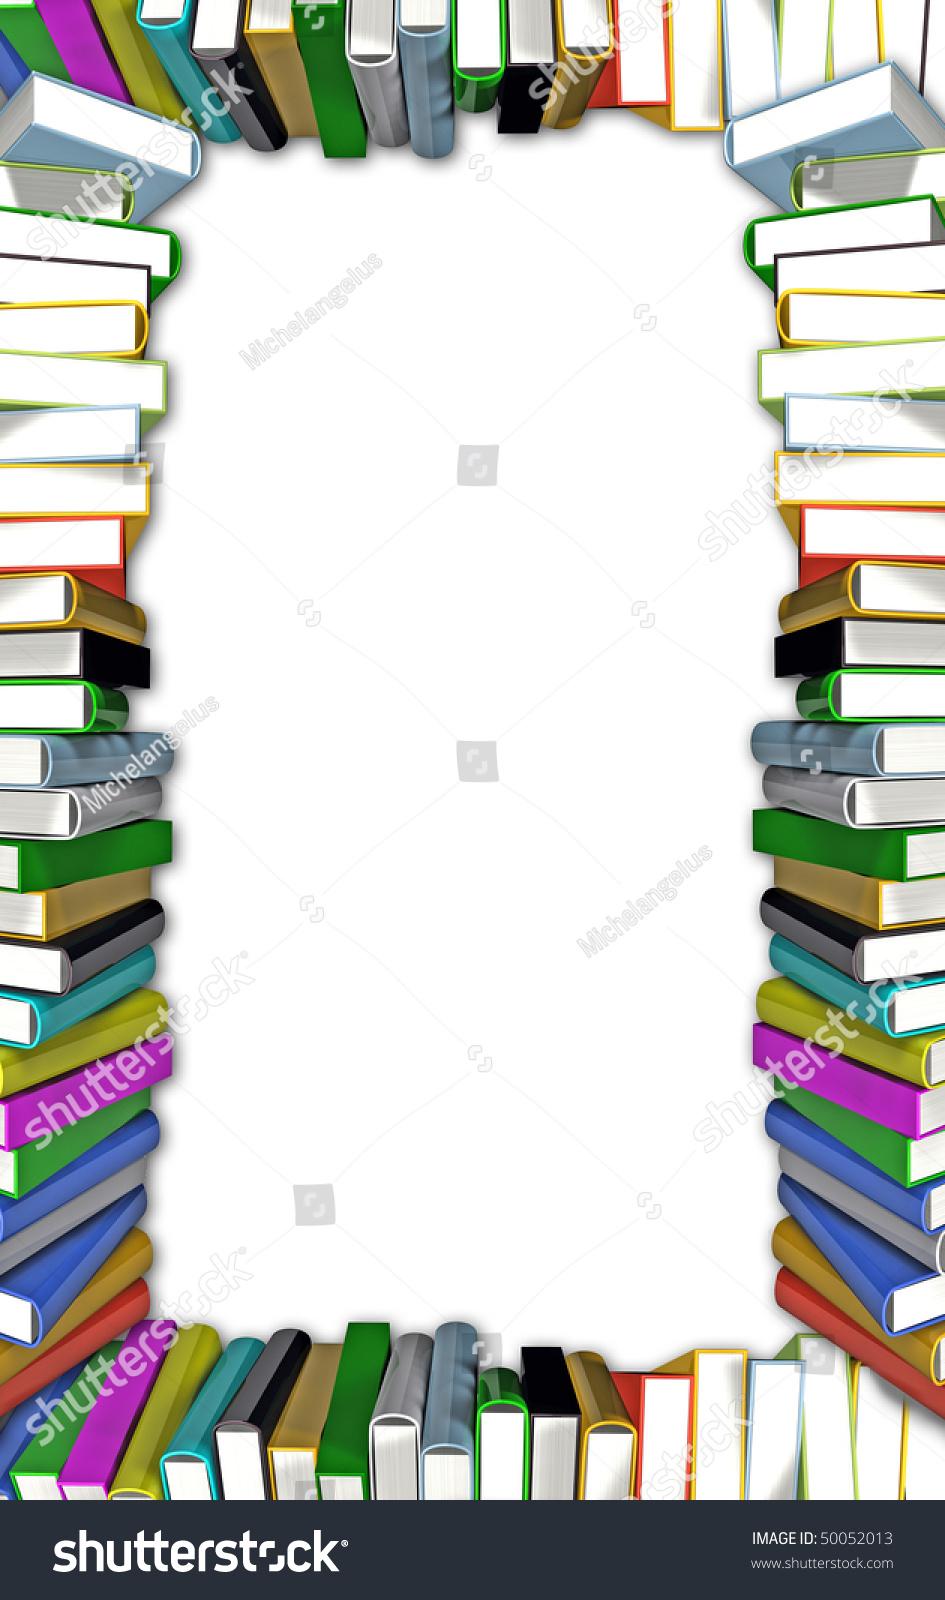 border colorful books isolated on white stock illustration